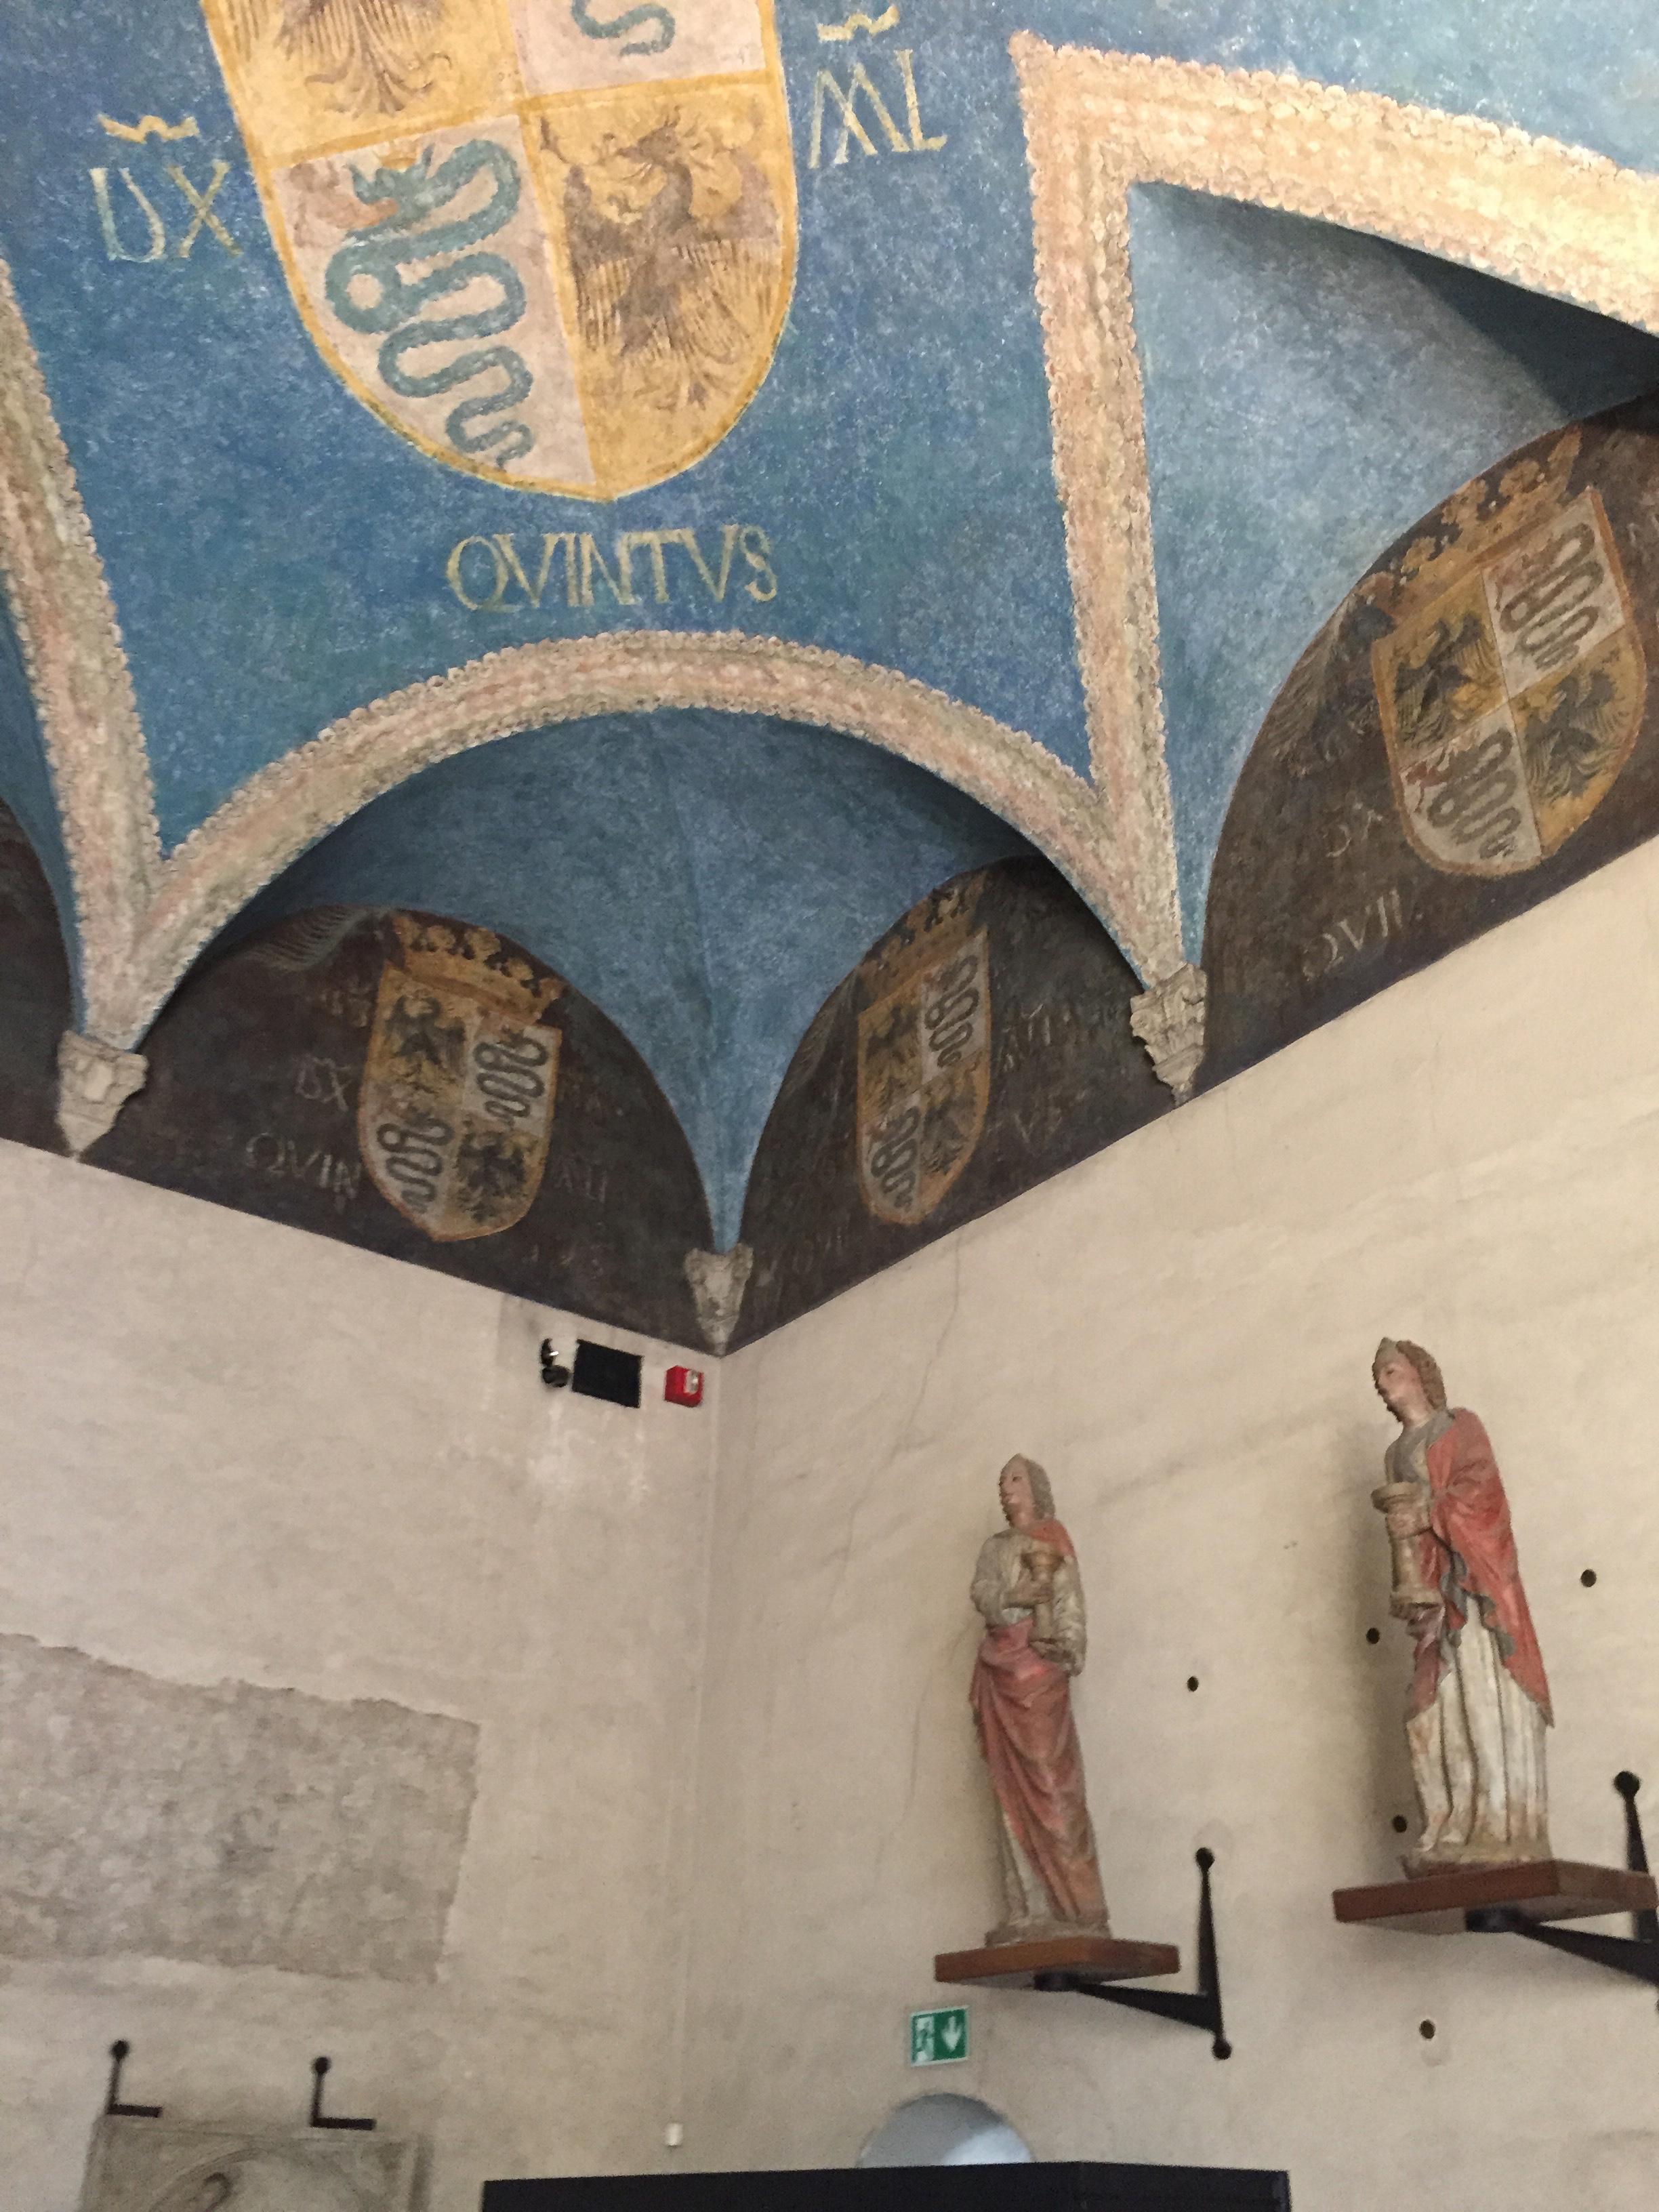 Castello Sforza vault room n stats